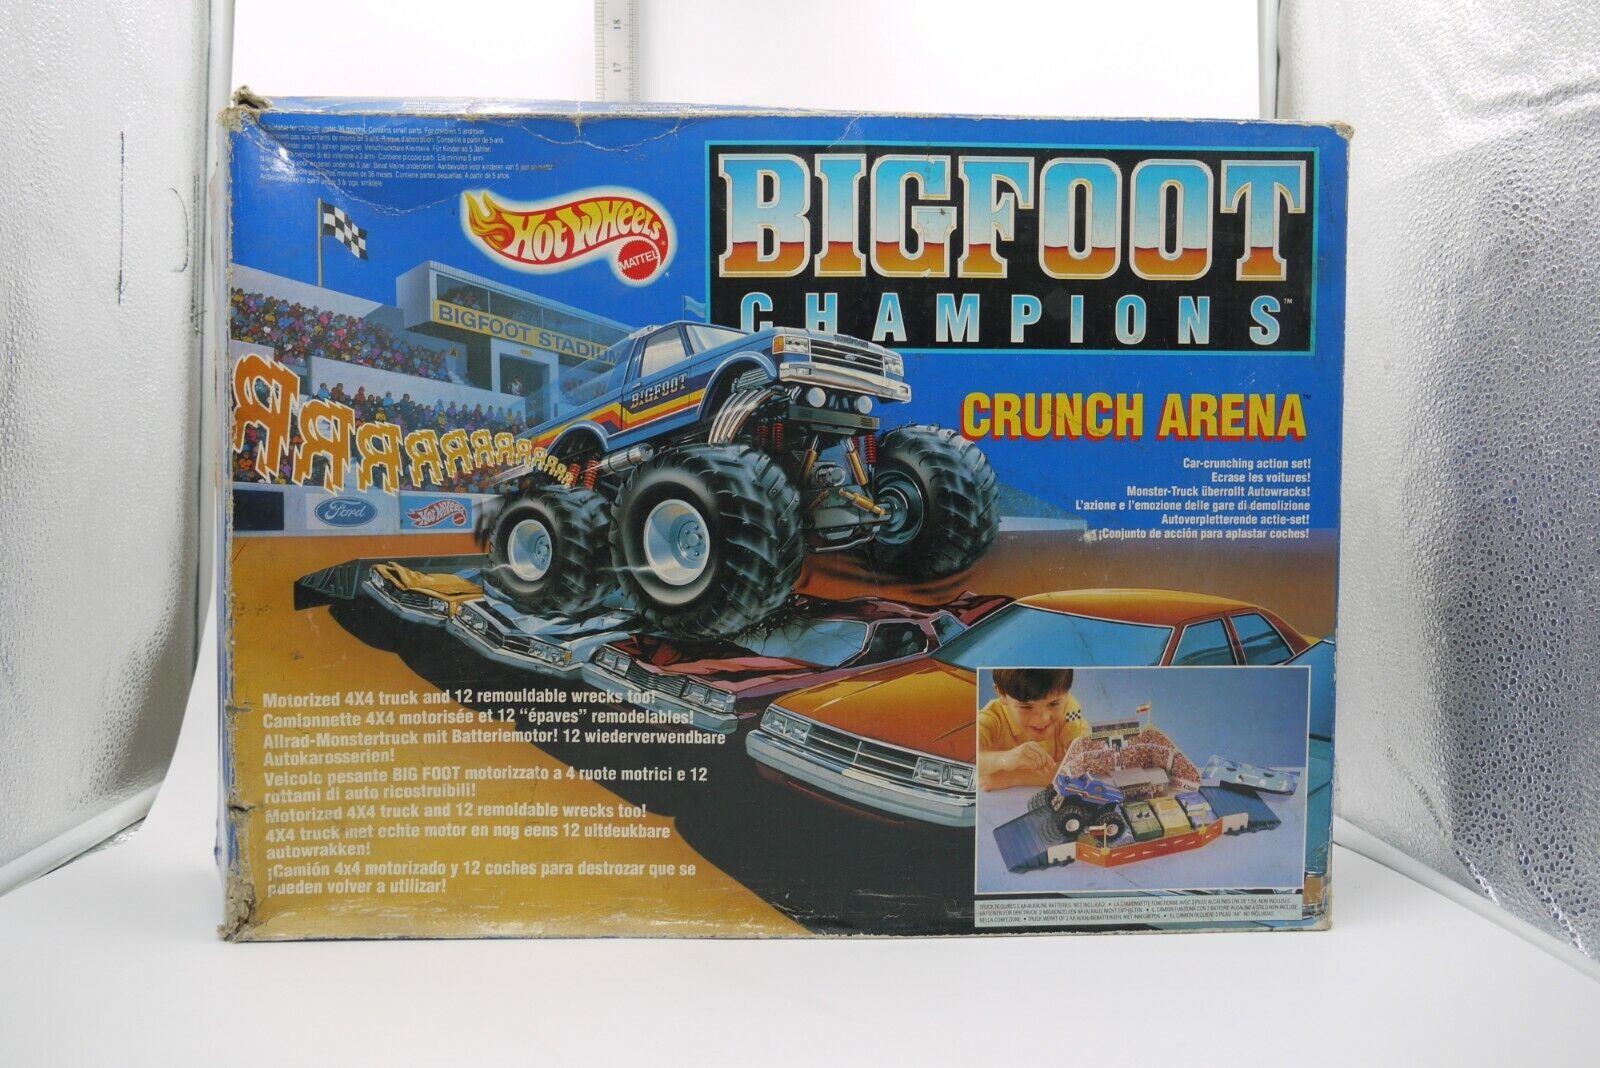 Vintage 1991 HOT WHEELS Bigfoot Champions Crunch Arena Playset MATTEL BOXED